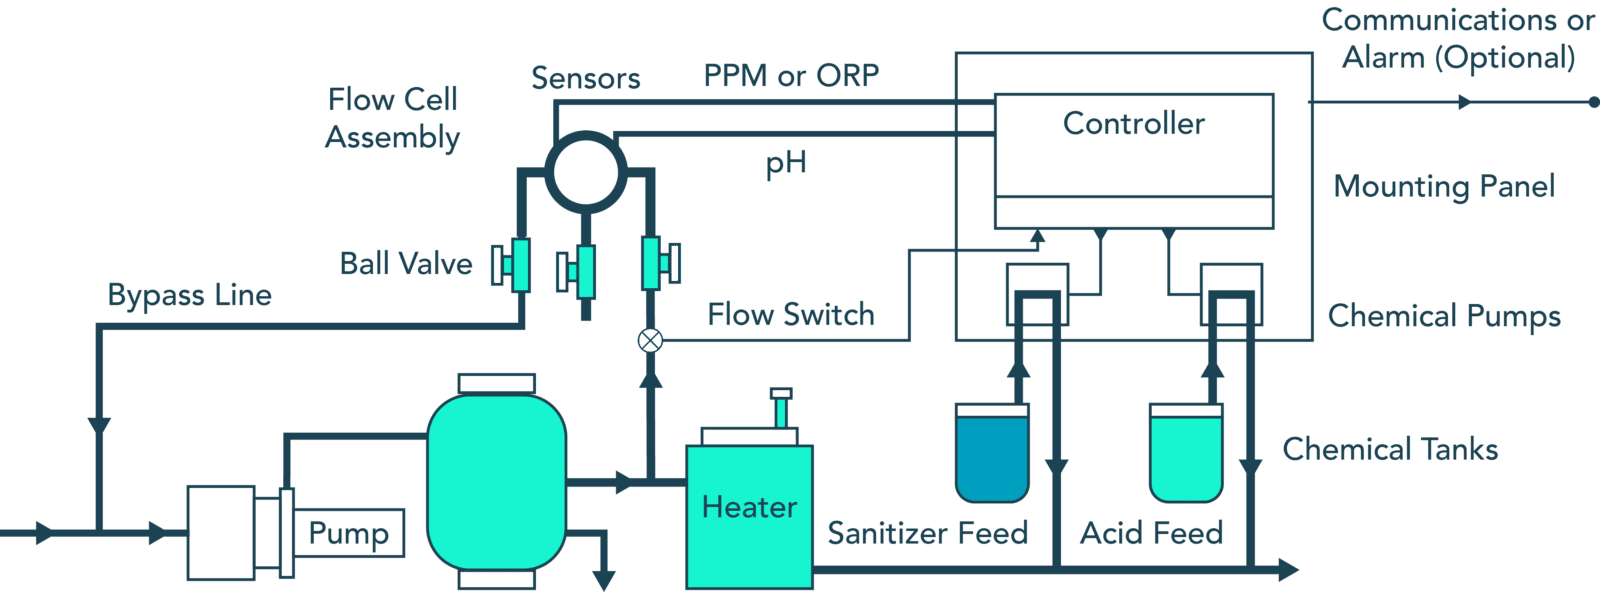 pool schematic wiring wiring library Marine Engine Wiring Diagram pool schematic auto electrical wiring diagram pool schematic